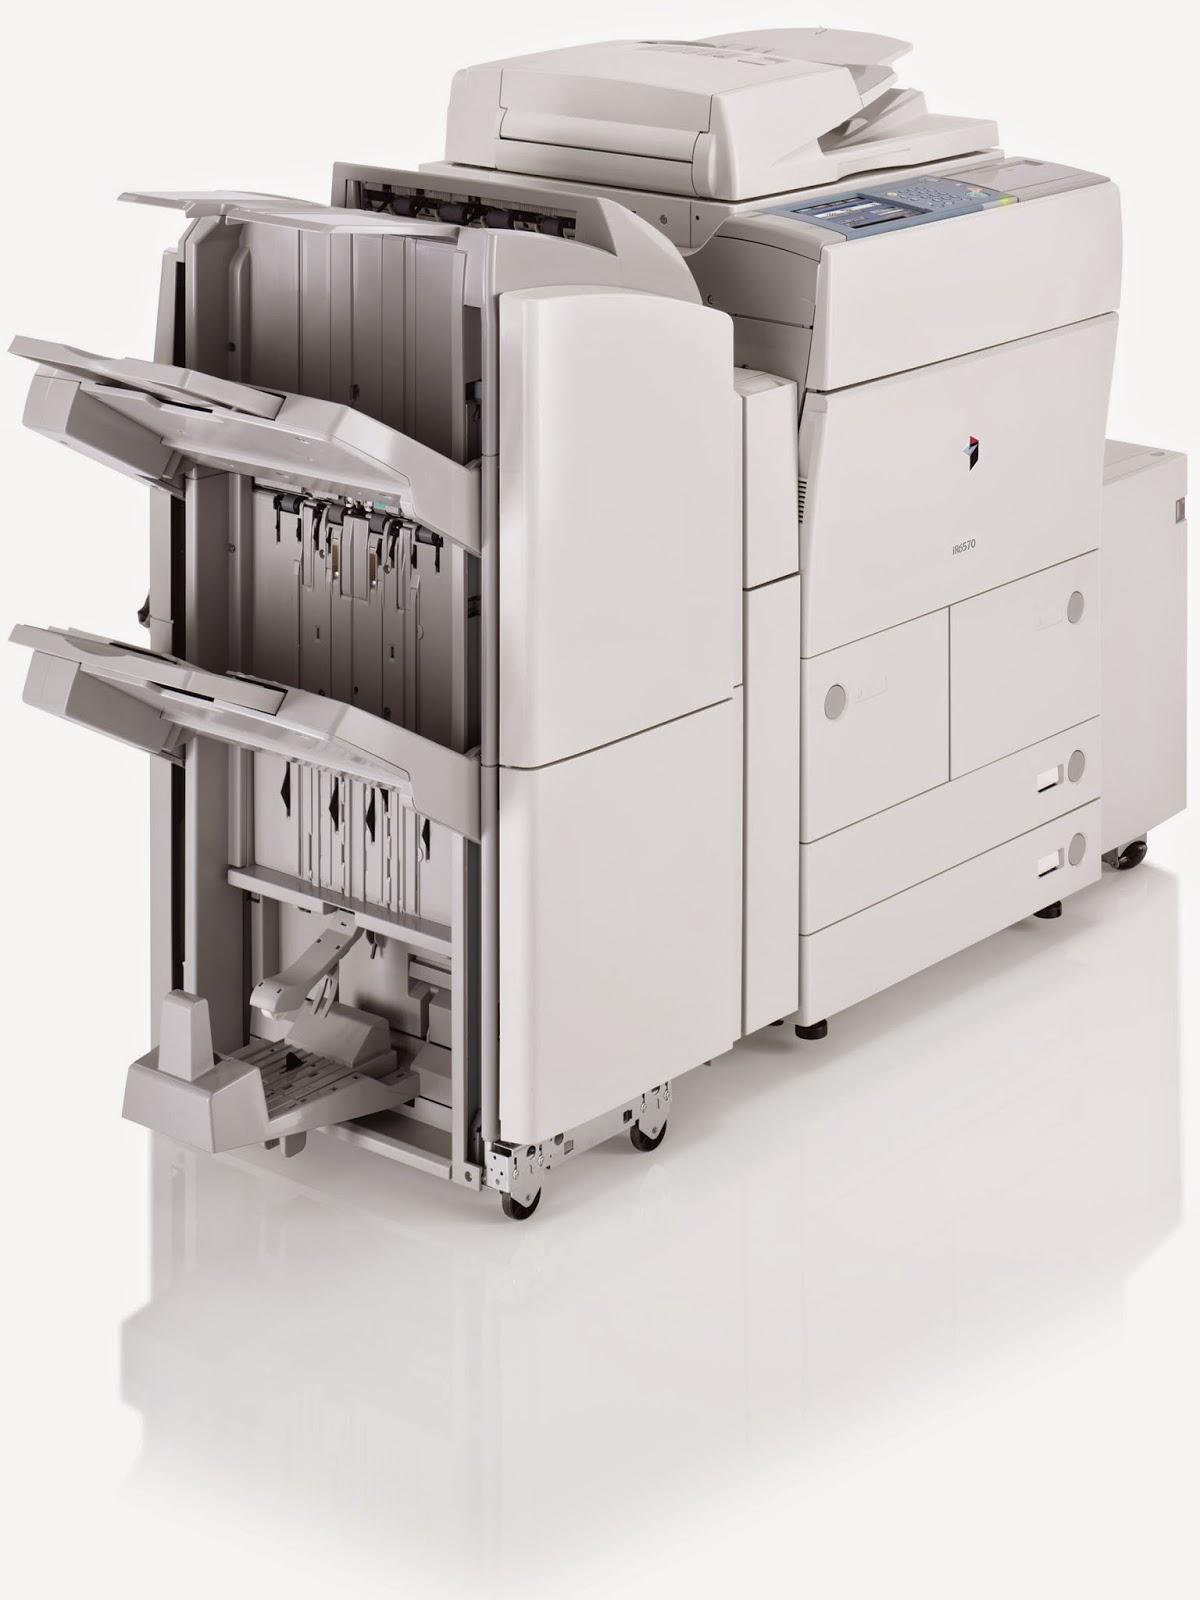 mesin fotocopy Canon Image Runner 6570